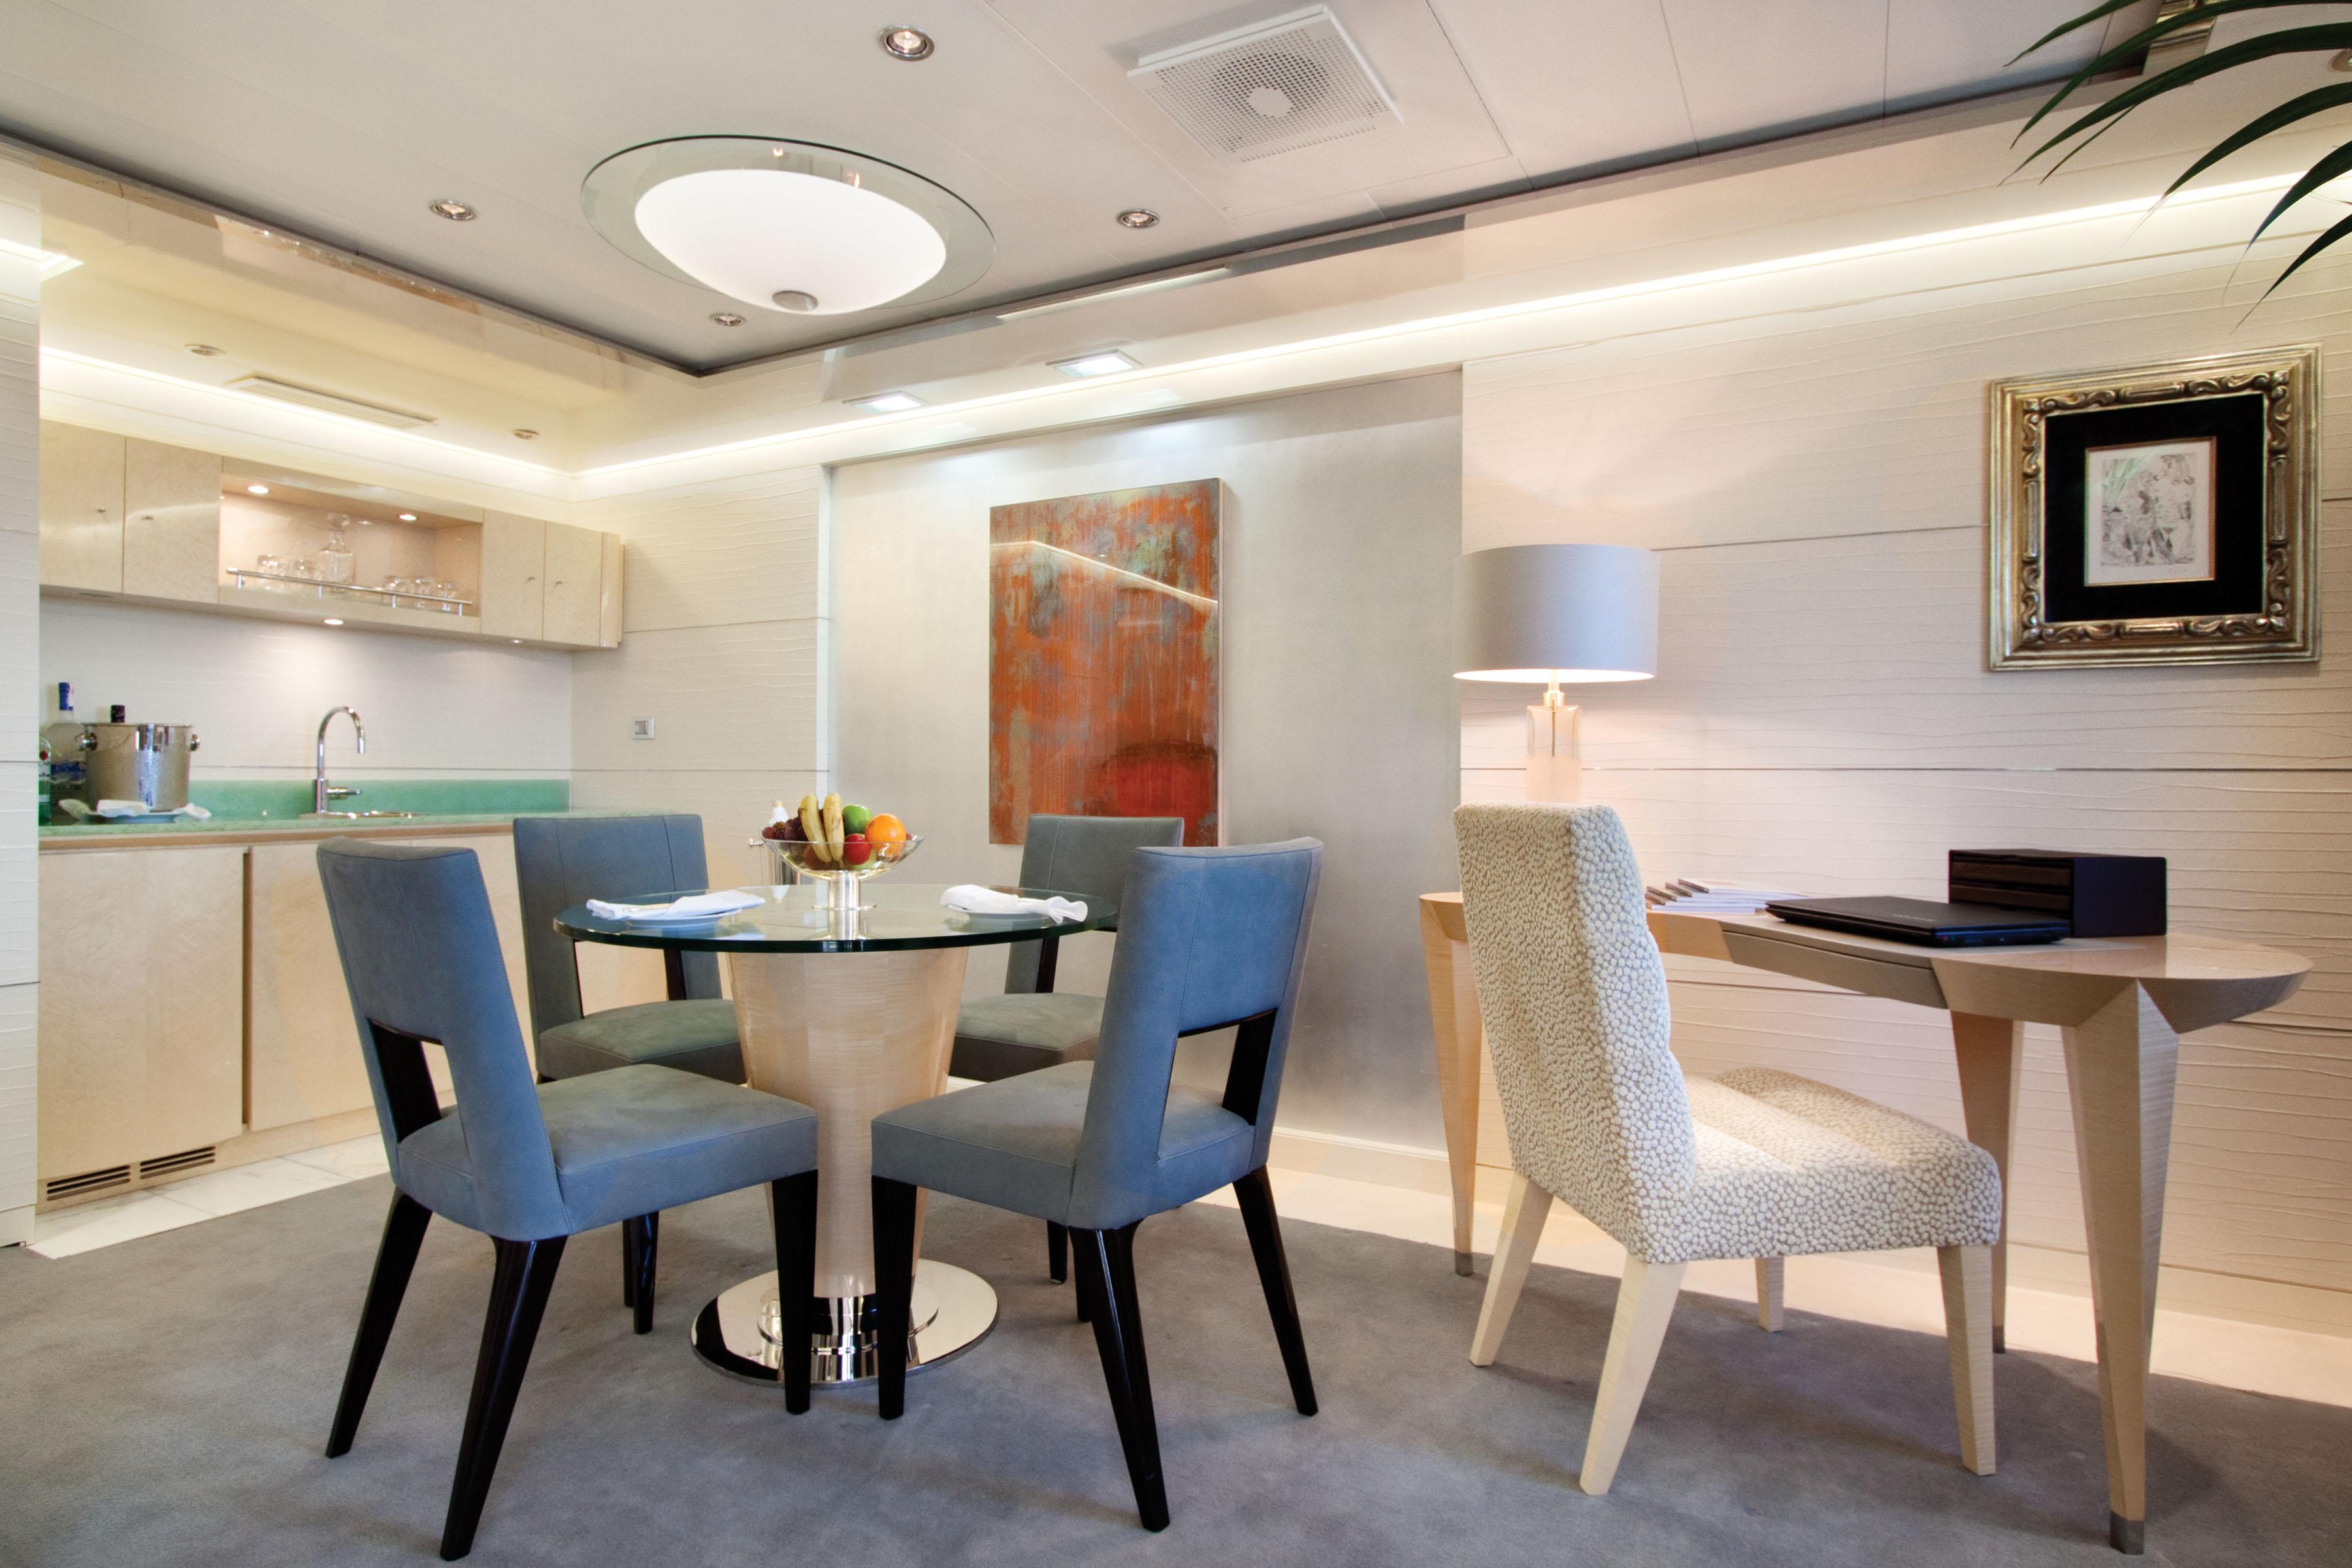 Oceania Cruises Oceania Class Accommodation Vista Suite Kitchen.jpg